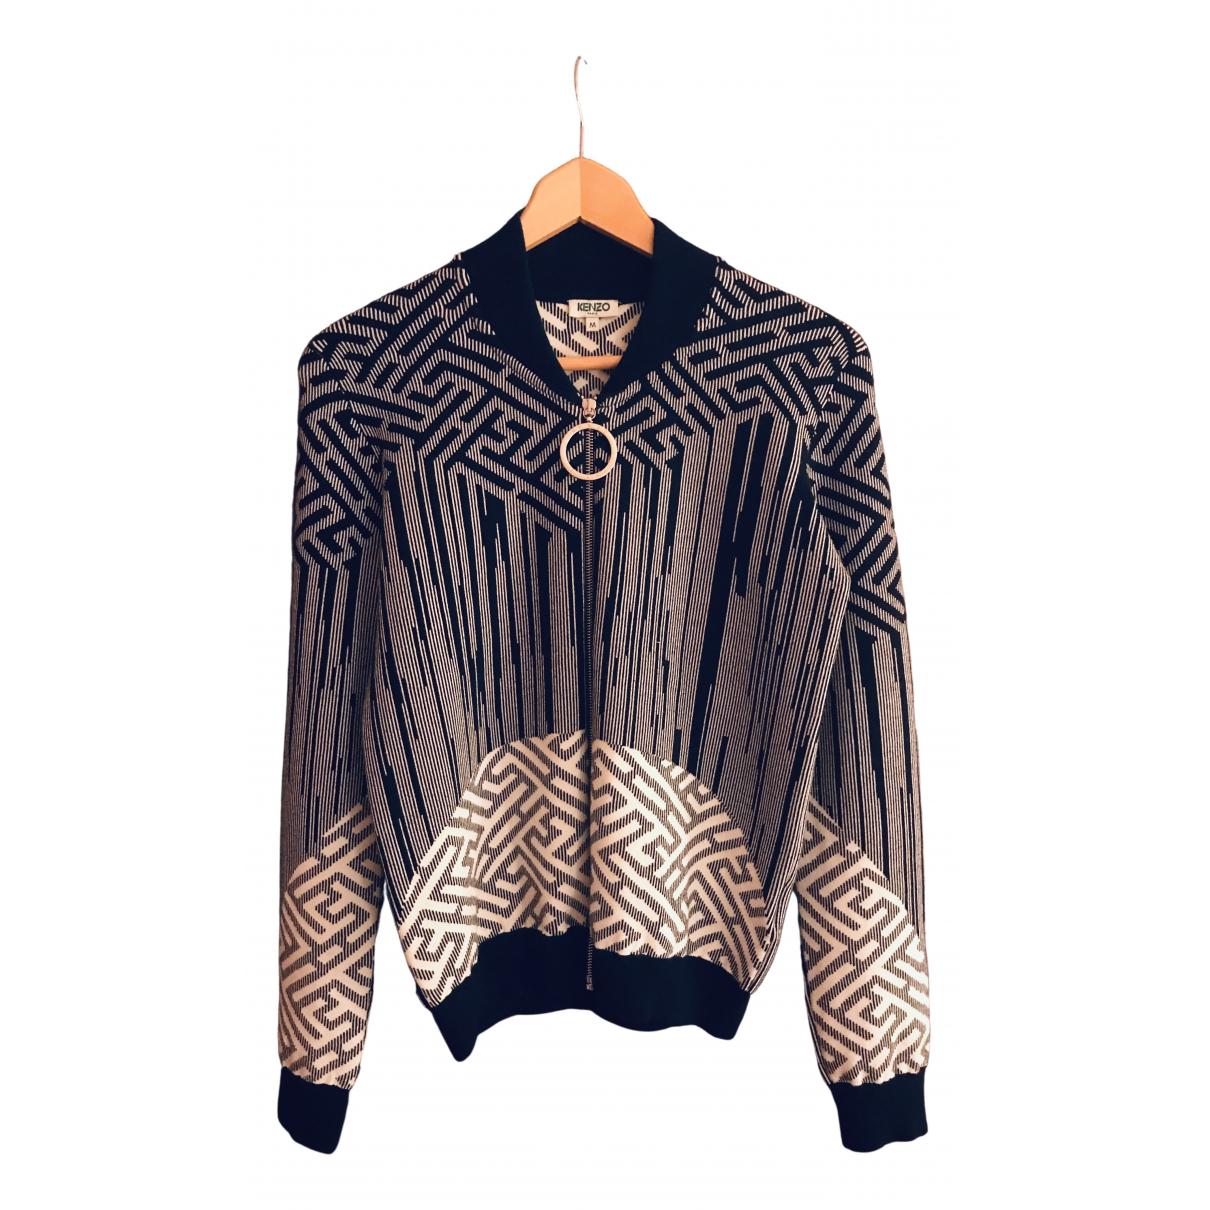 Kenzo \N Black Leather jacket for Women M International